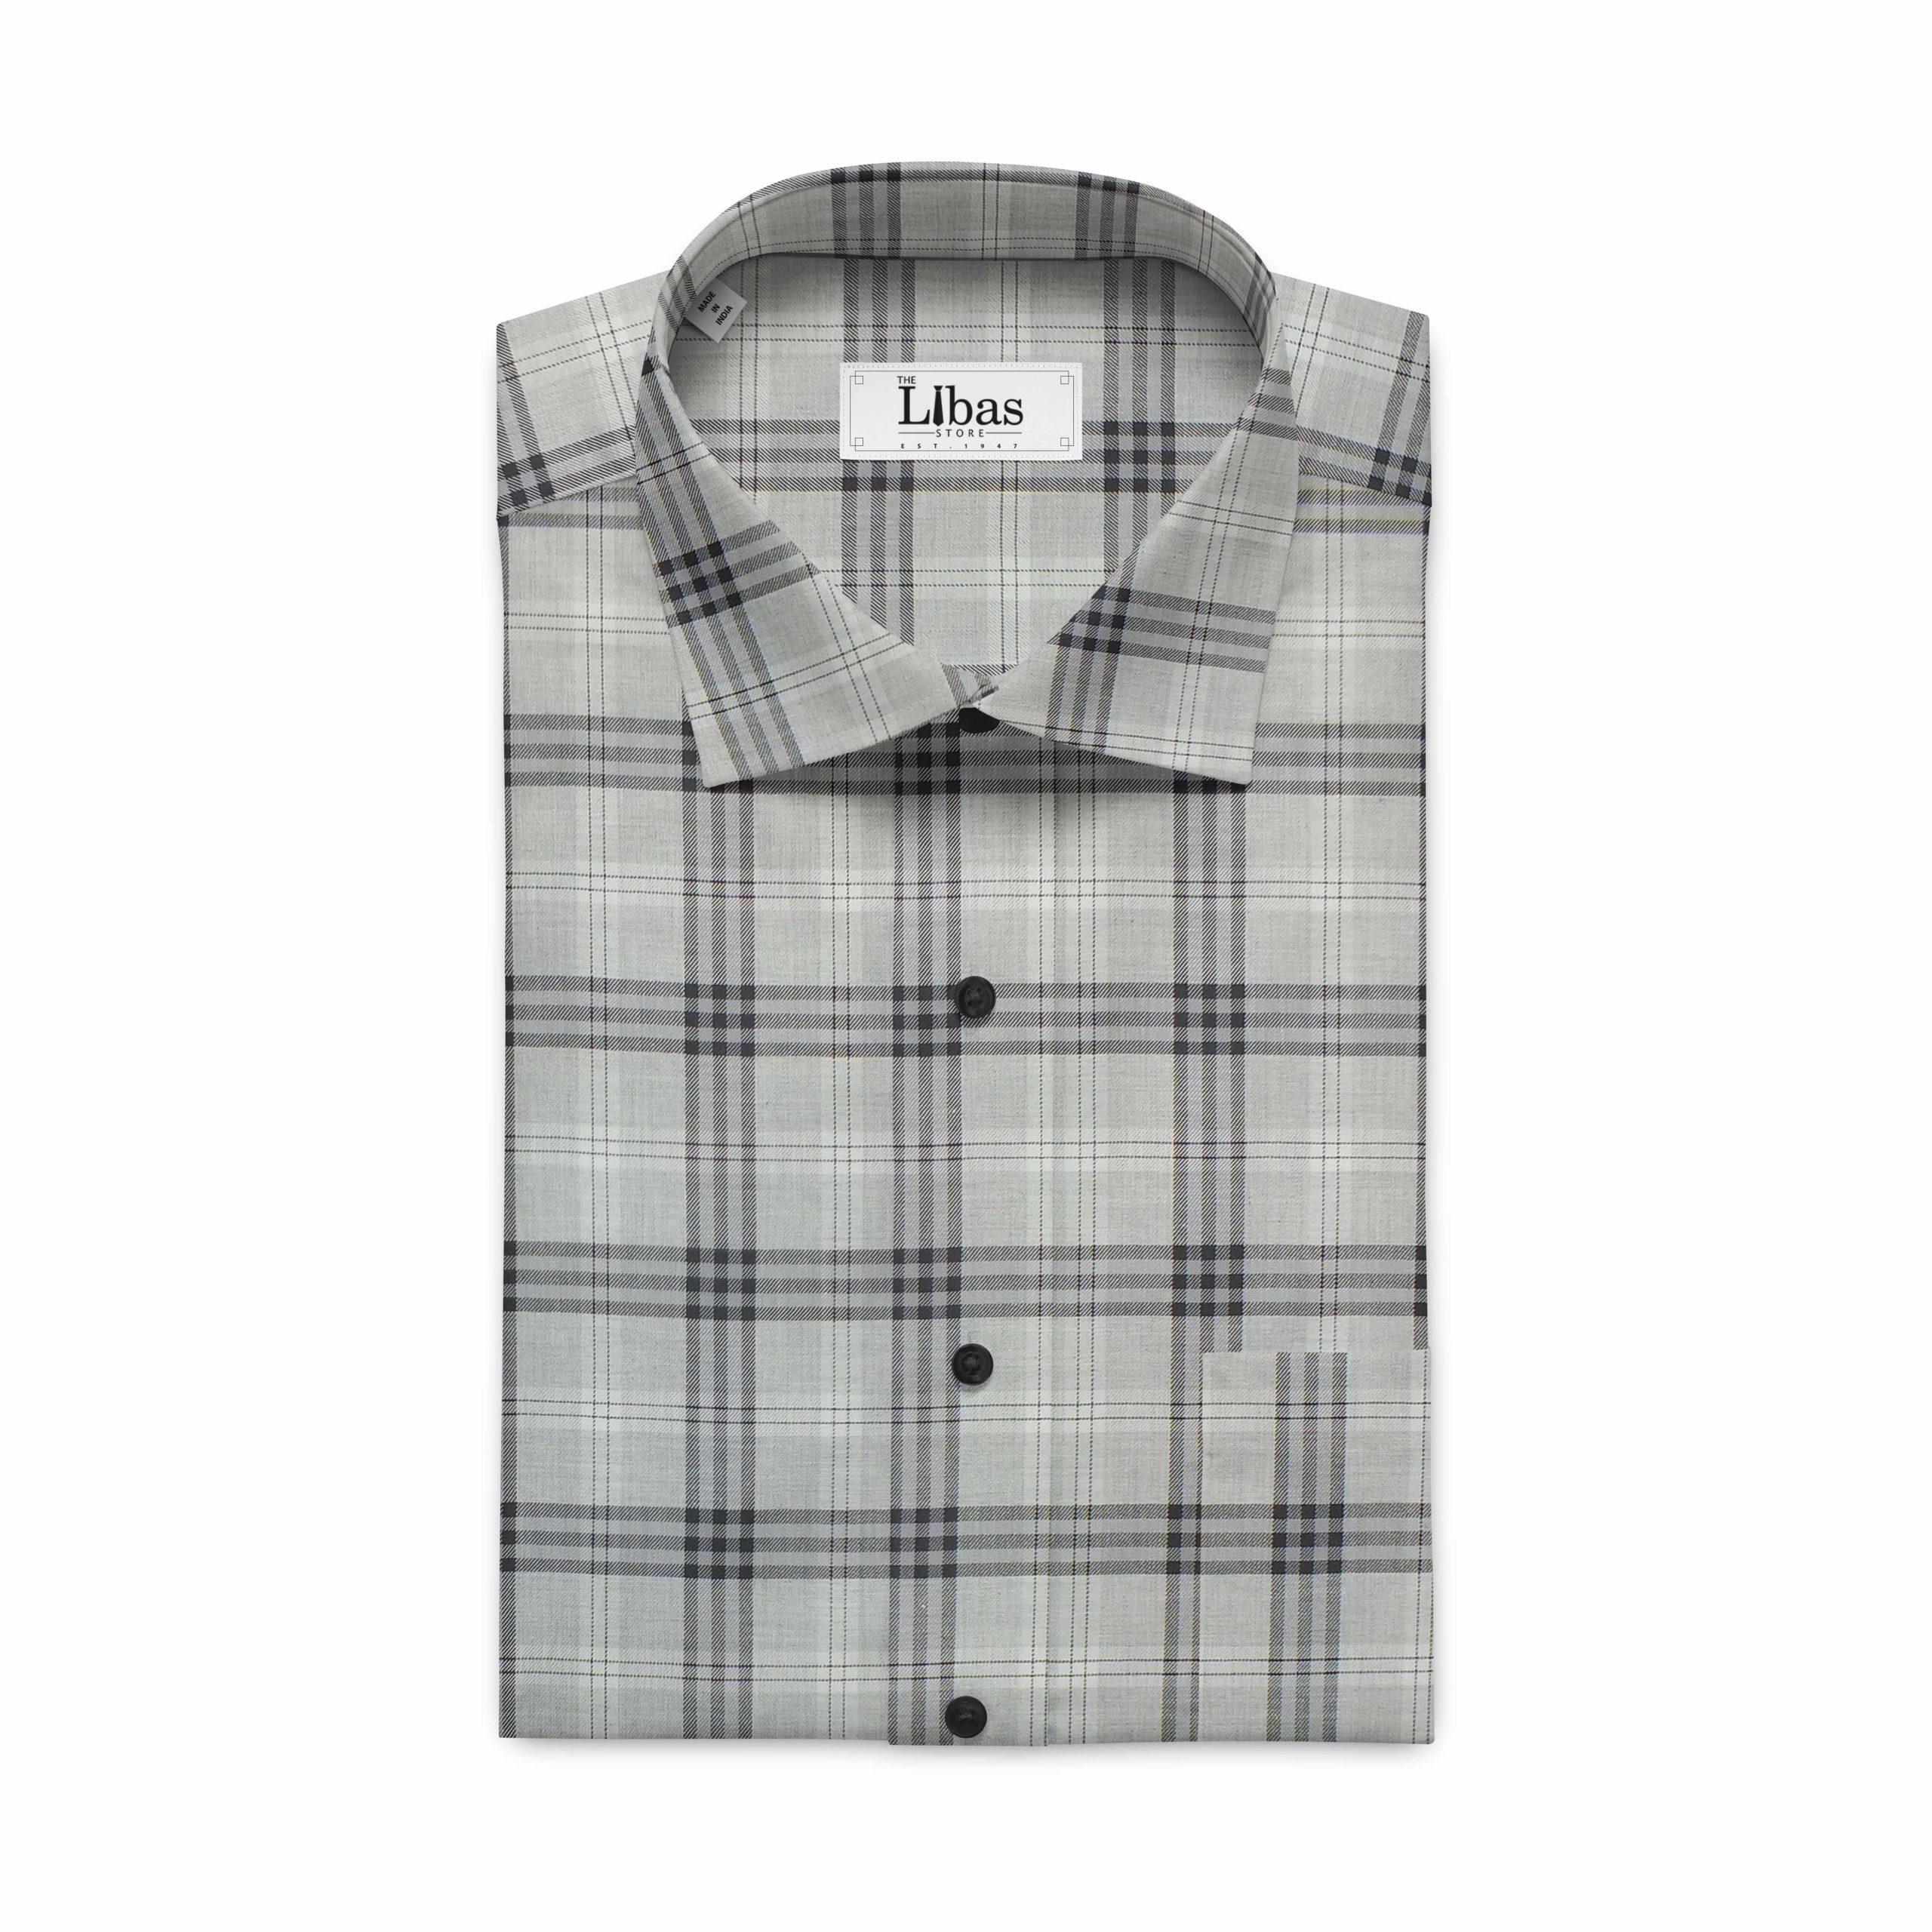 Soktas Men's Light Grey& Black Giza Cotton Burberry Check Twill Weave Shirt Fabric